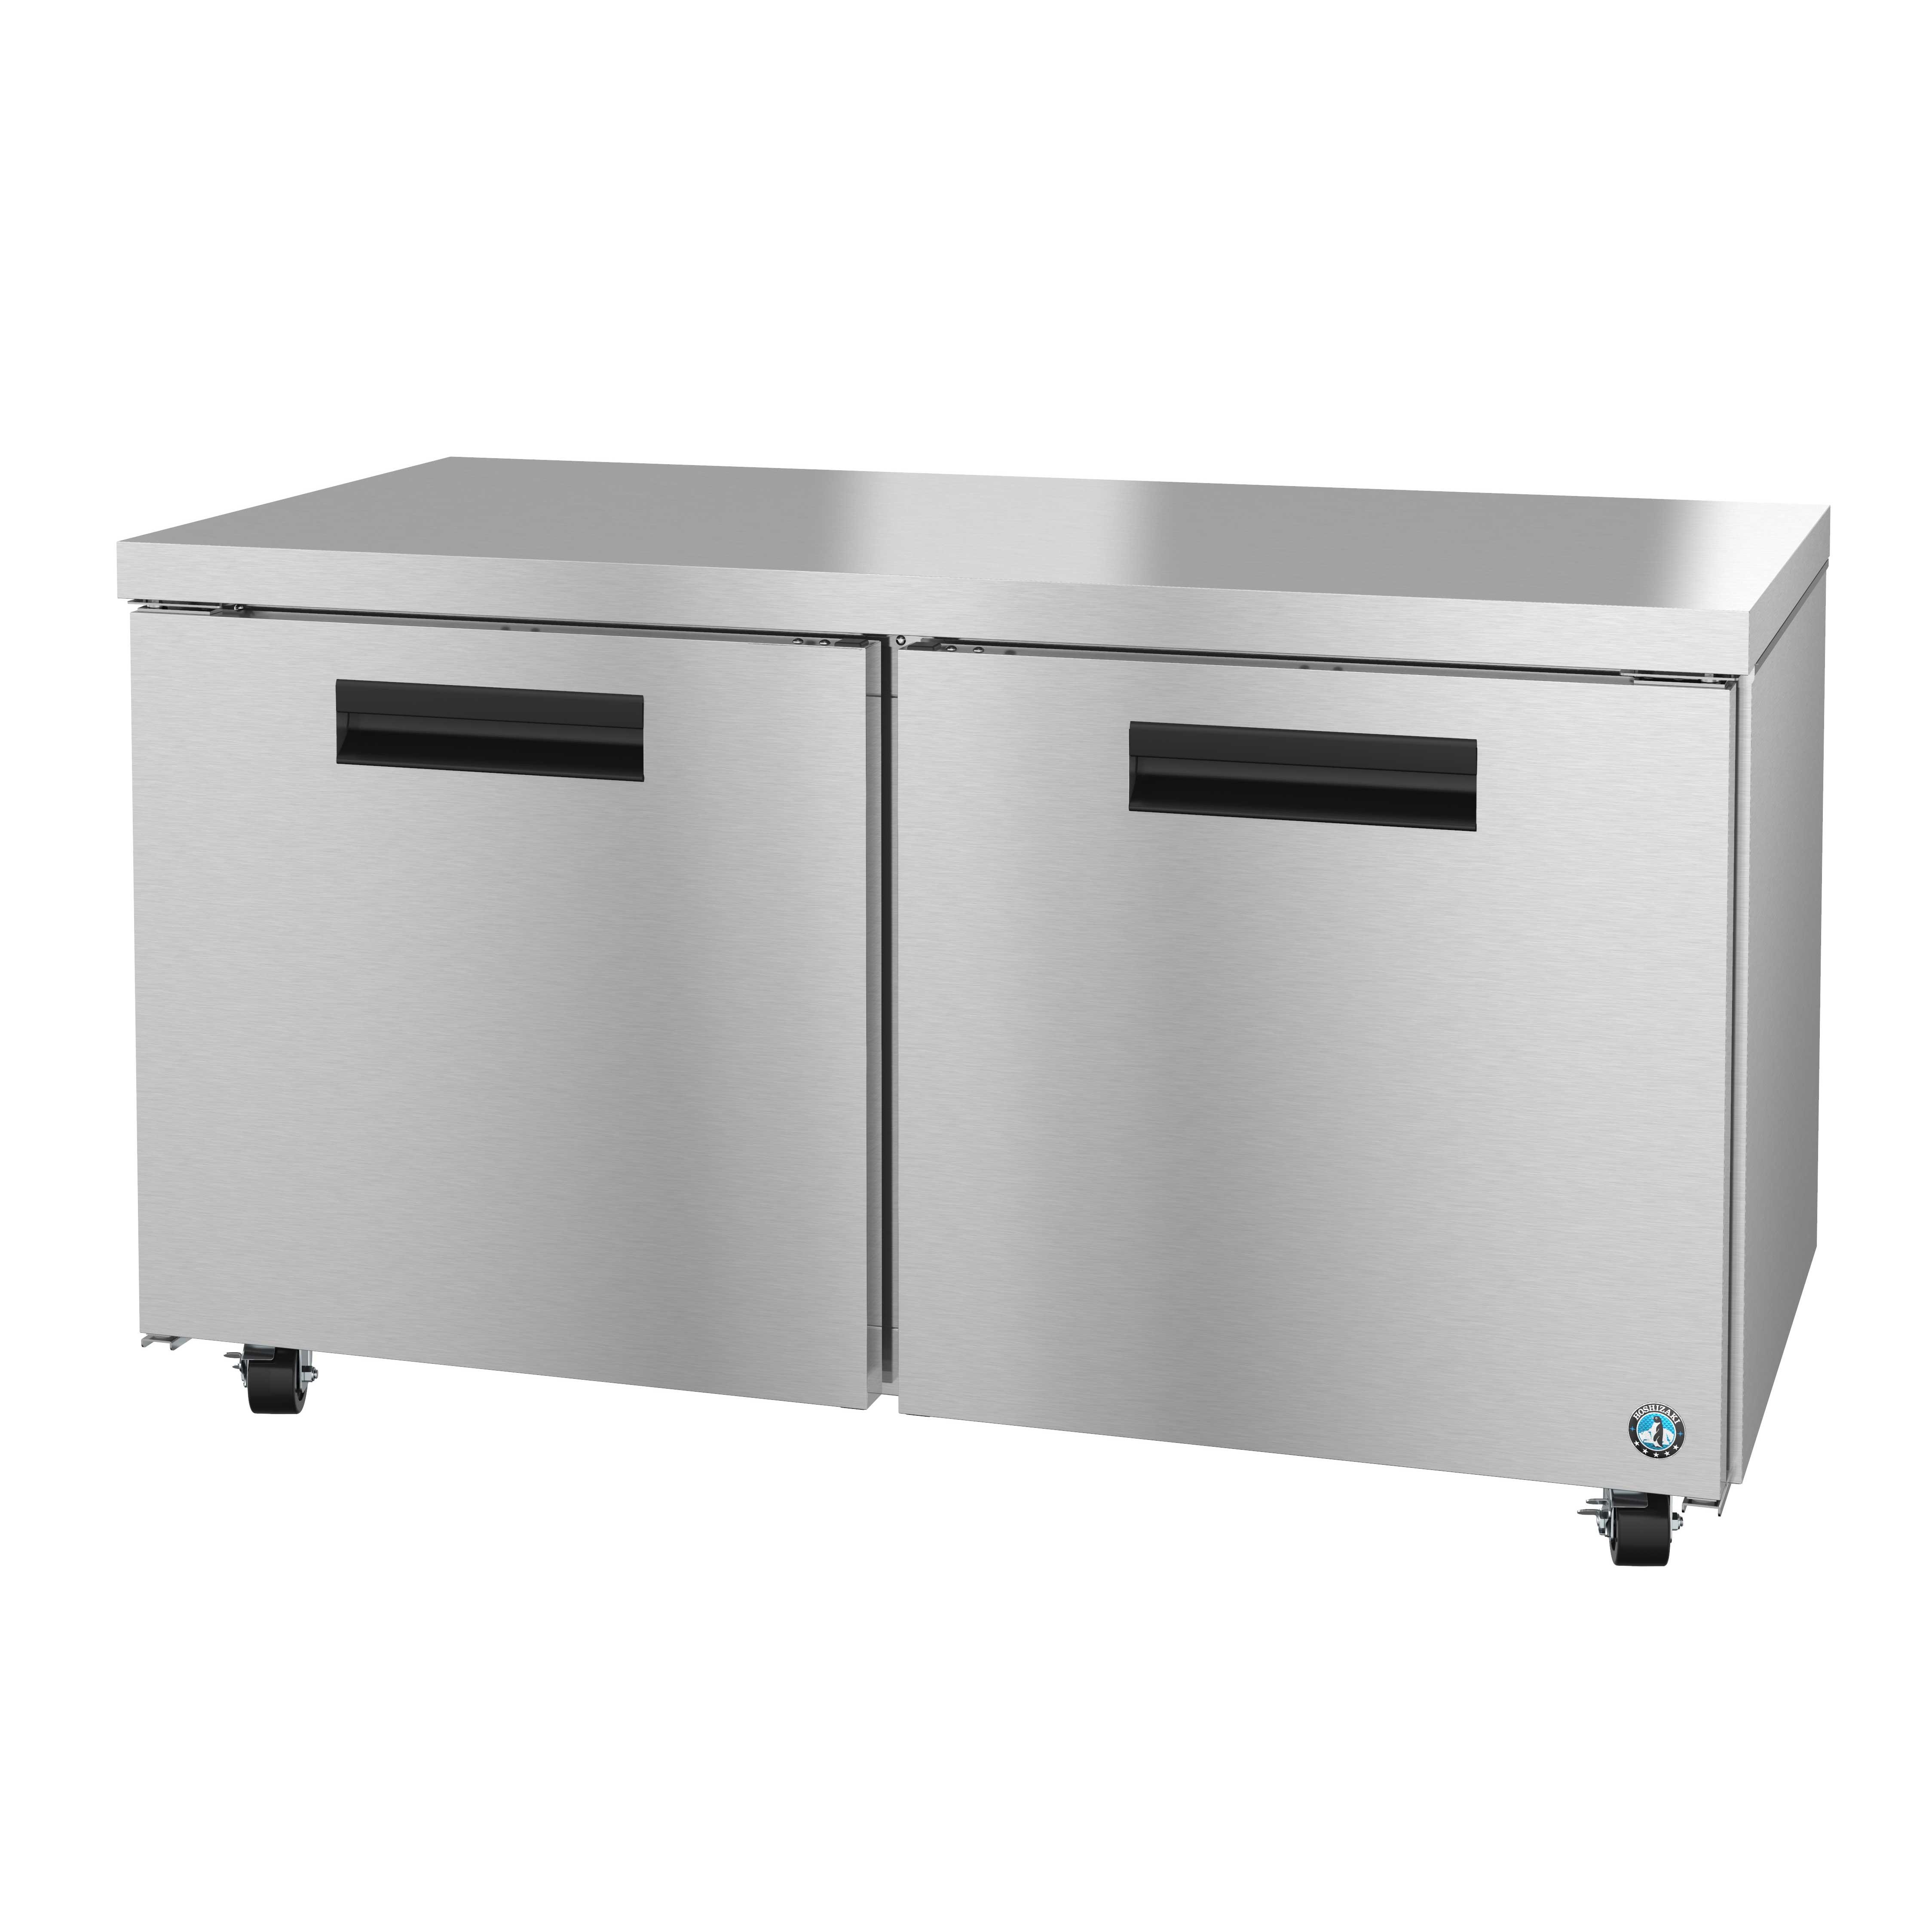 Hoshizaki UF60A-01 freezer, undercounter, reach-in